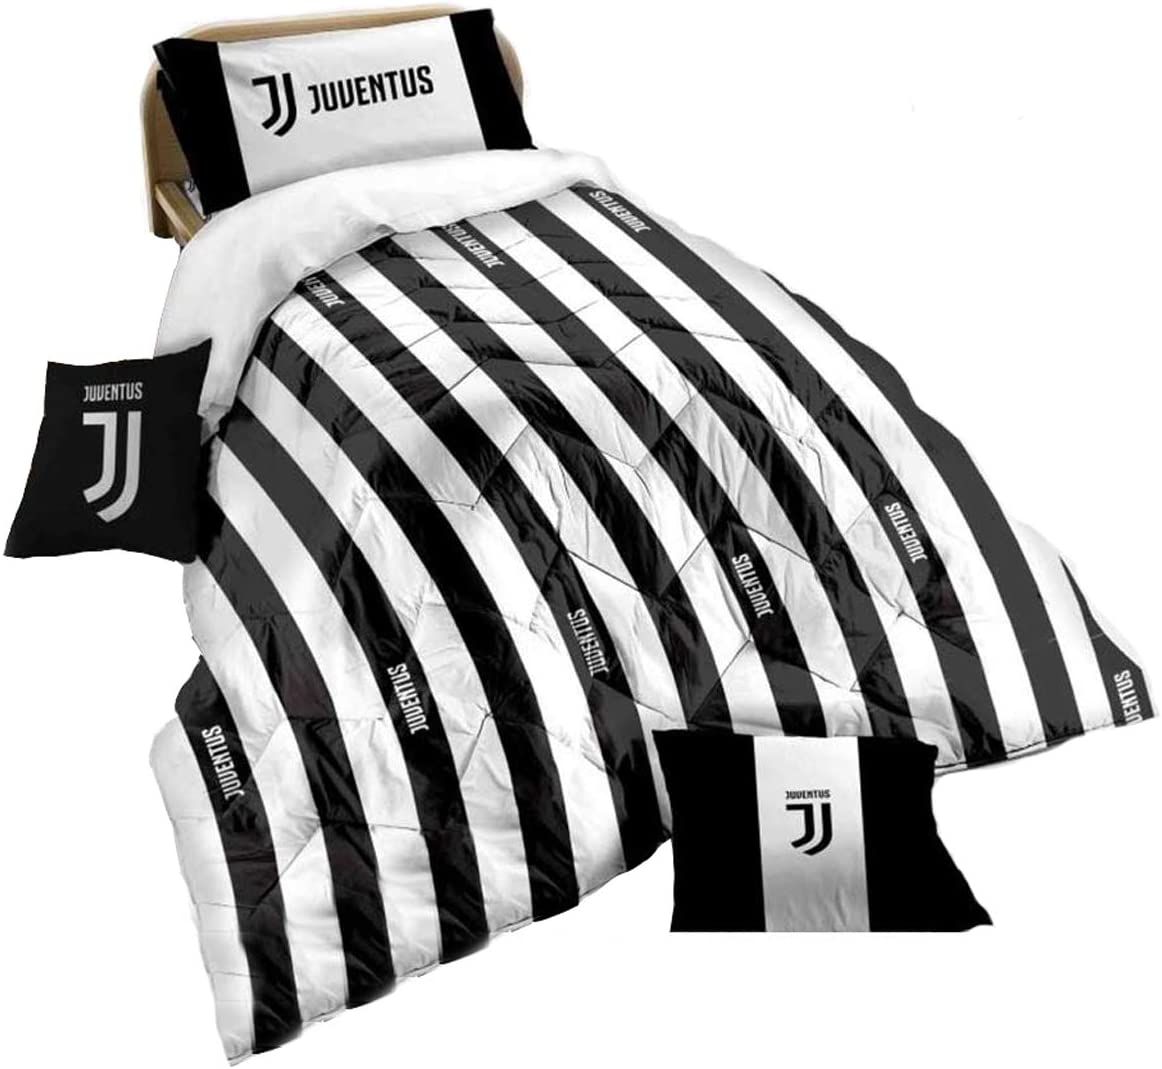 Piumone Juventus Matrimoniale.Juventus Trapunta Matrimoniale 260x270 Prodotto Ufficiale Juve Due